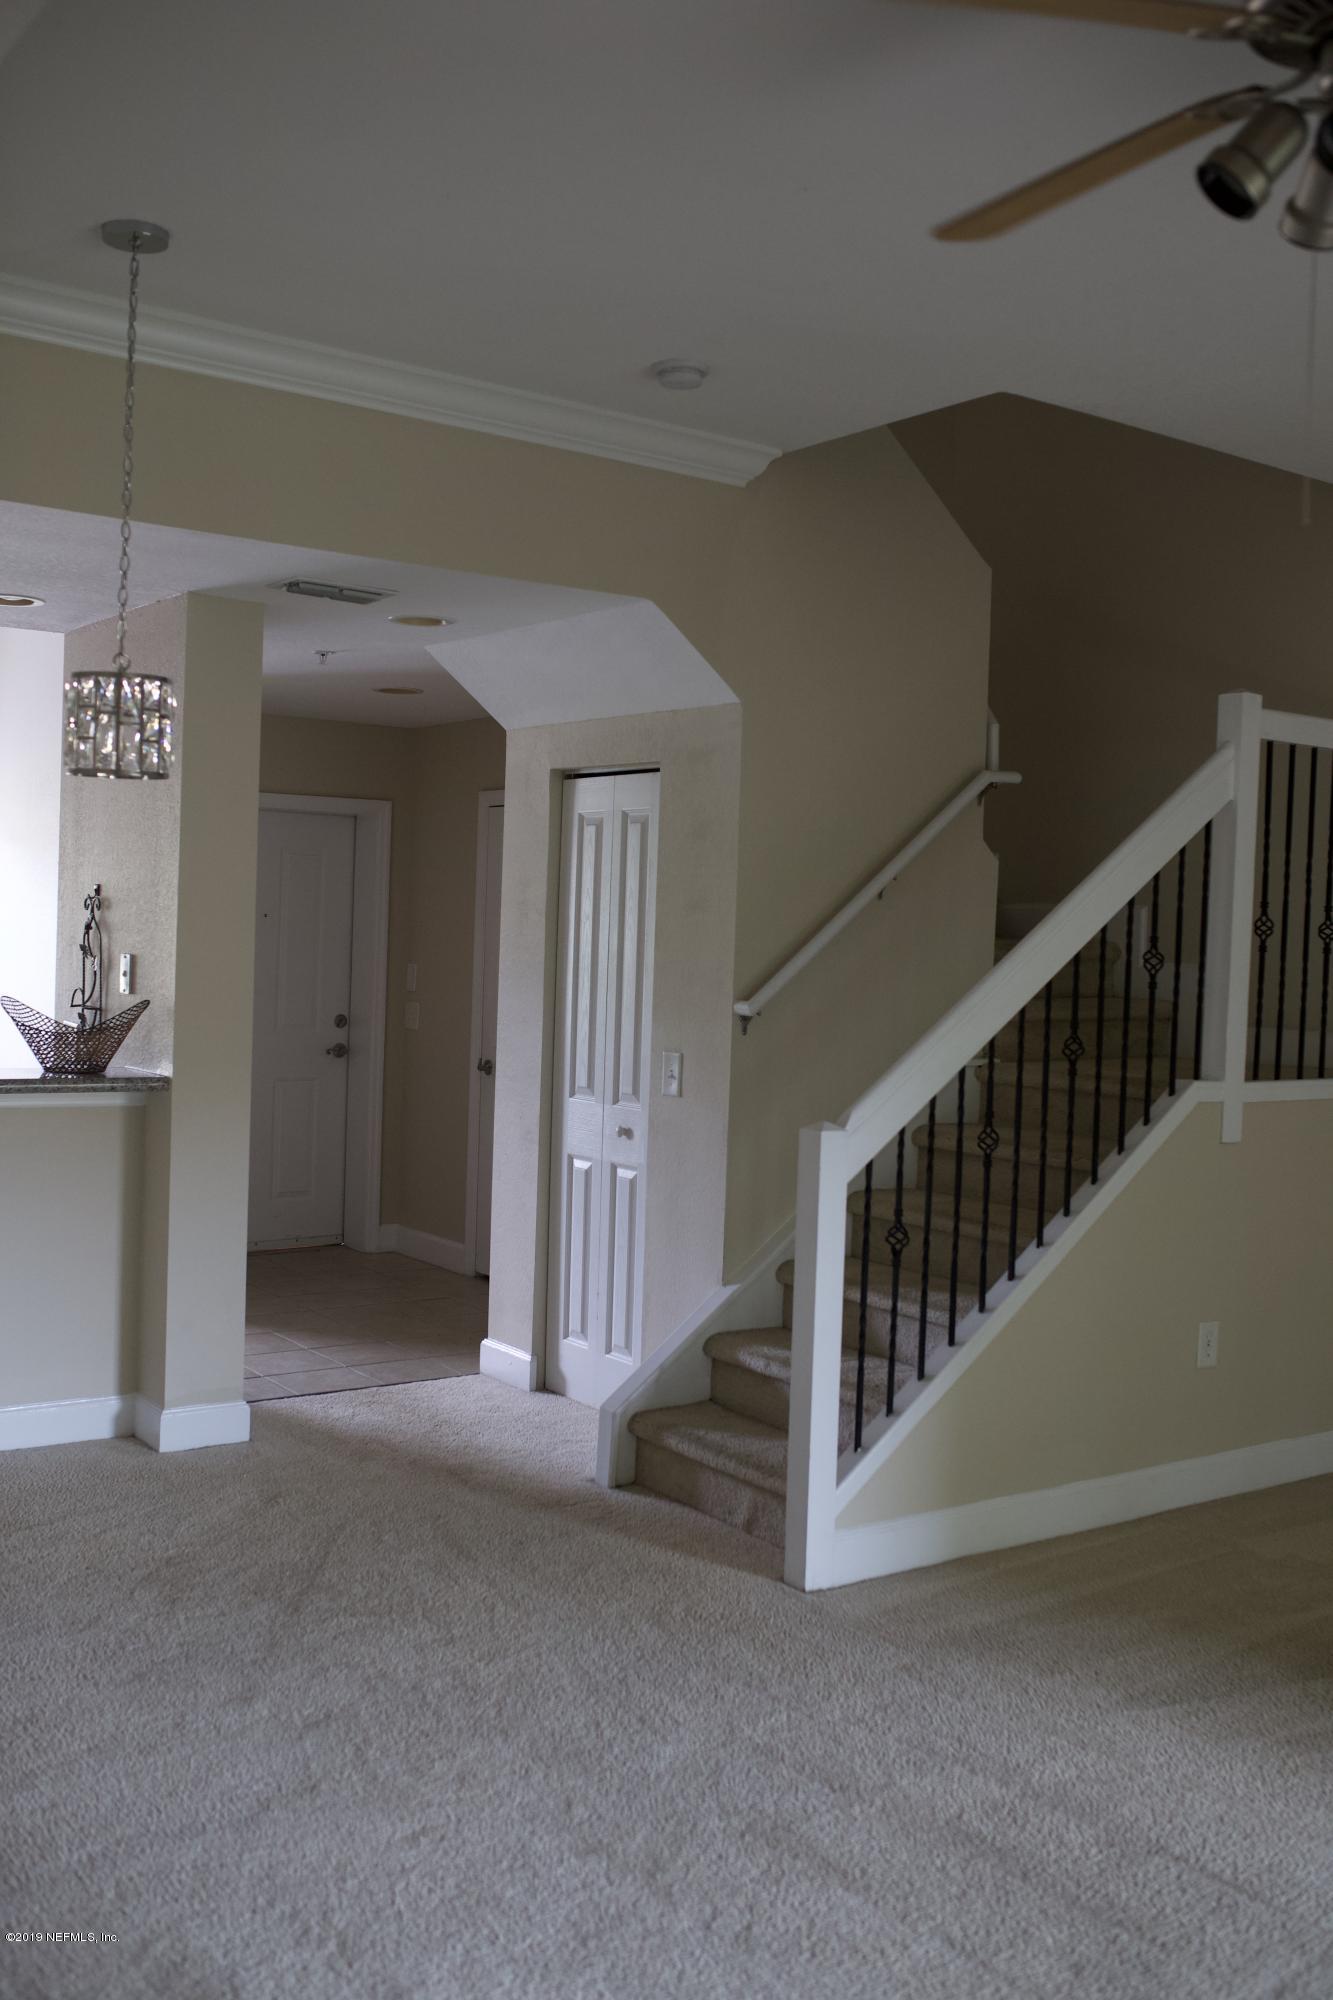 9745 TOUCHTON, JACKSONVILLE, FLORIDA 32246, 2 Bedrooms Bedrooms, ,2 BathroomsBathrooms,Condo,For sale,TOUCHTON,1015053